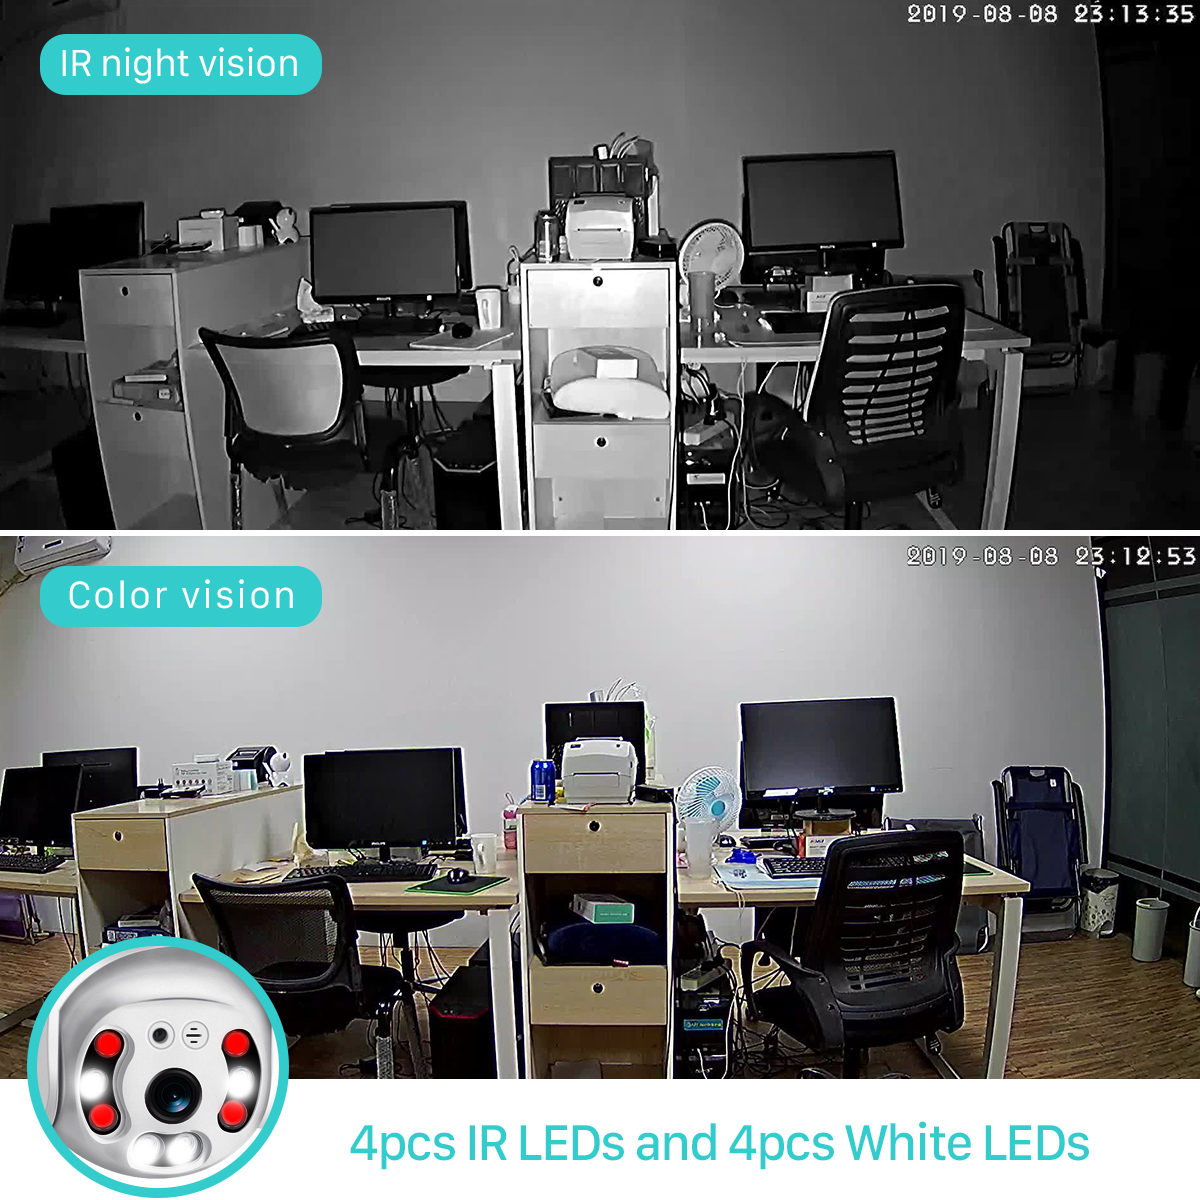 H7d1b63db217a4d70963e9d1275205648F BESDER 1080P Outdoor Speed Dome Wifi Camera 2MP H.265 Audio PTZ Wireless Camera Cloud-SD Slot ONVIF Home Surveillance IP Camera